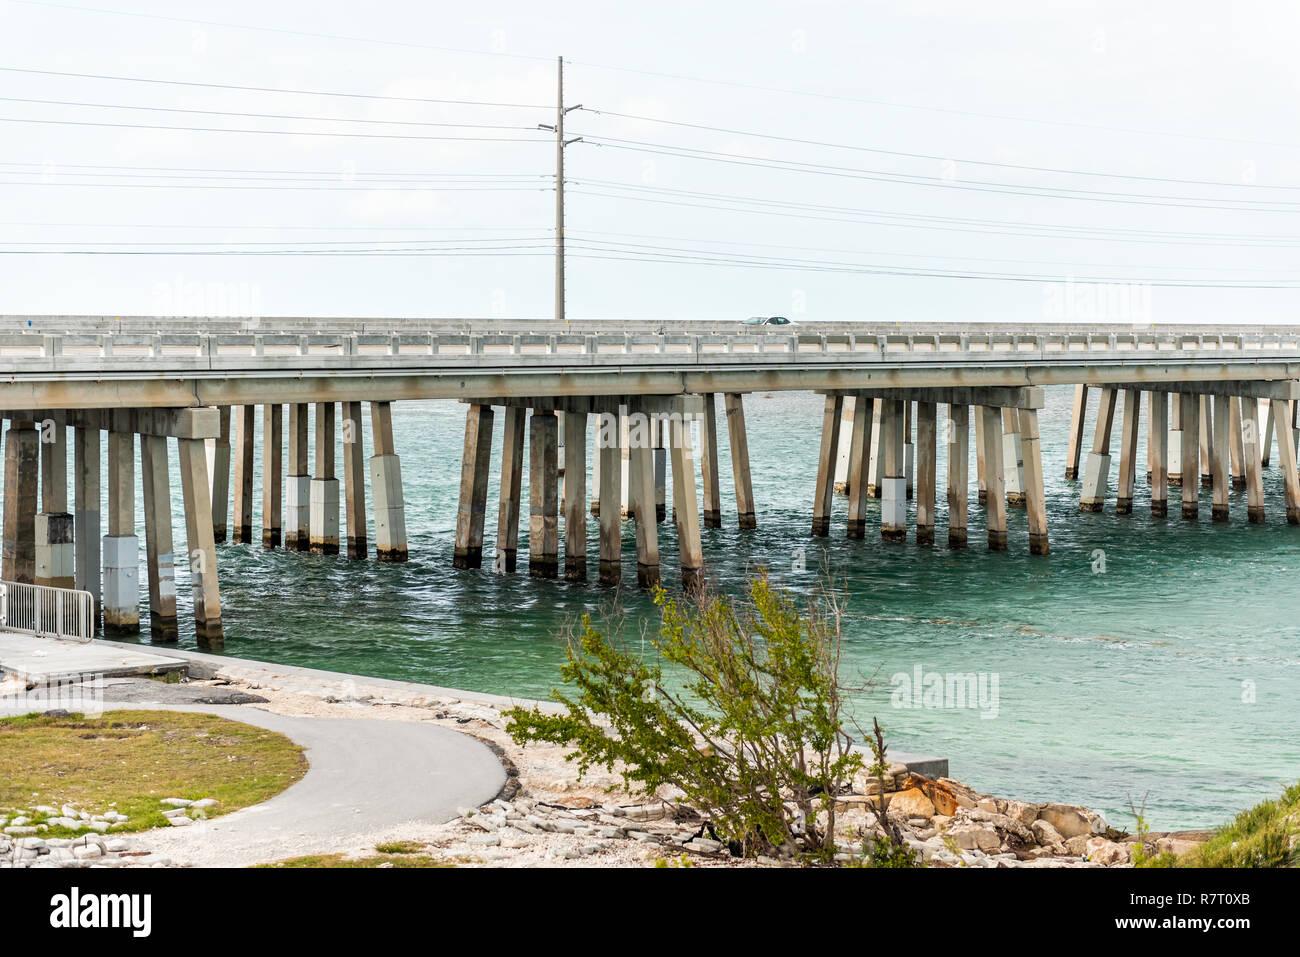 Seven Mile Bridge landscape of Florida Keys water atlantic ocean, beach on Overseas Highway, car on road - Stock Image